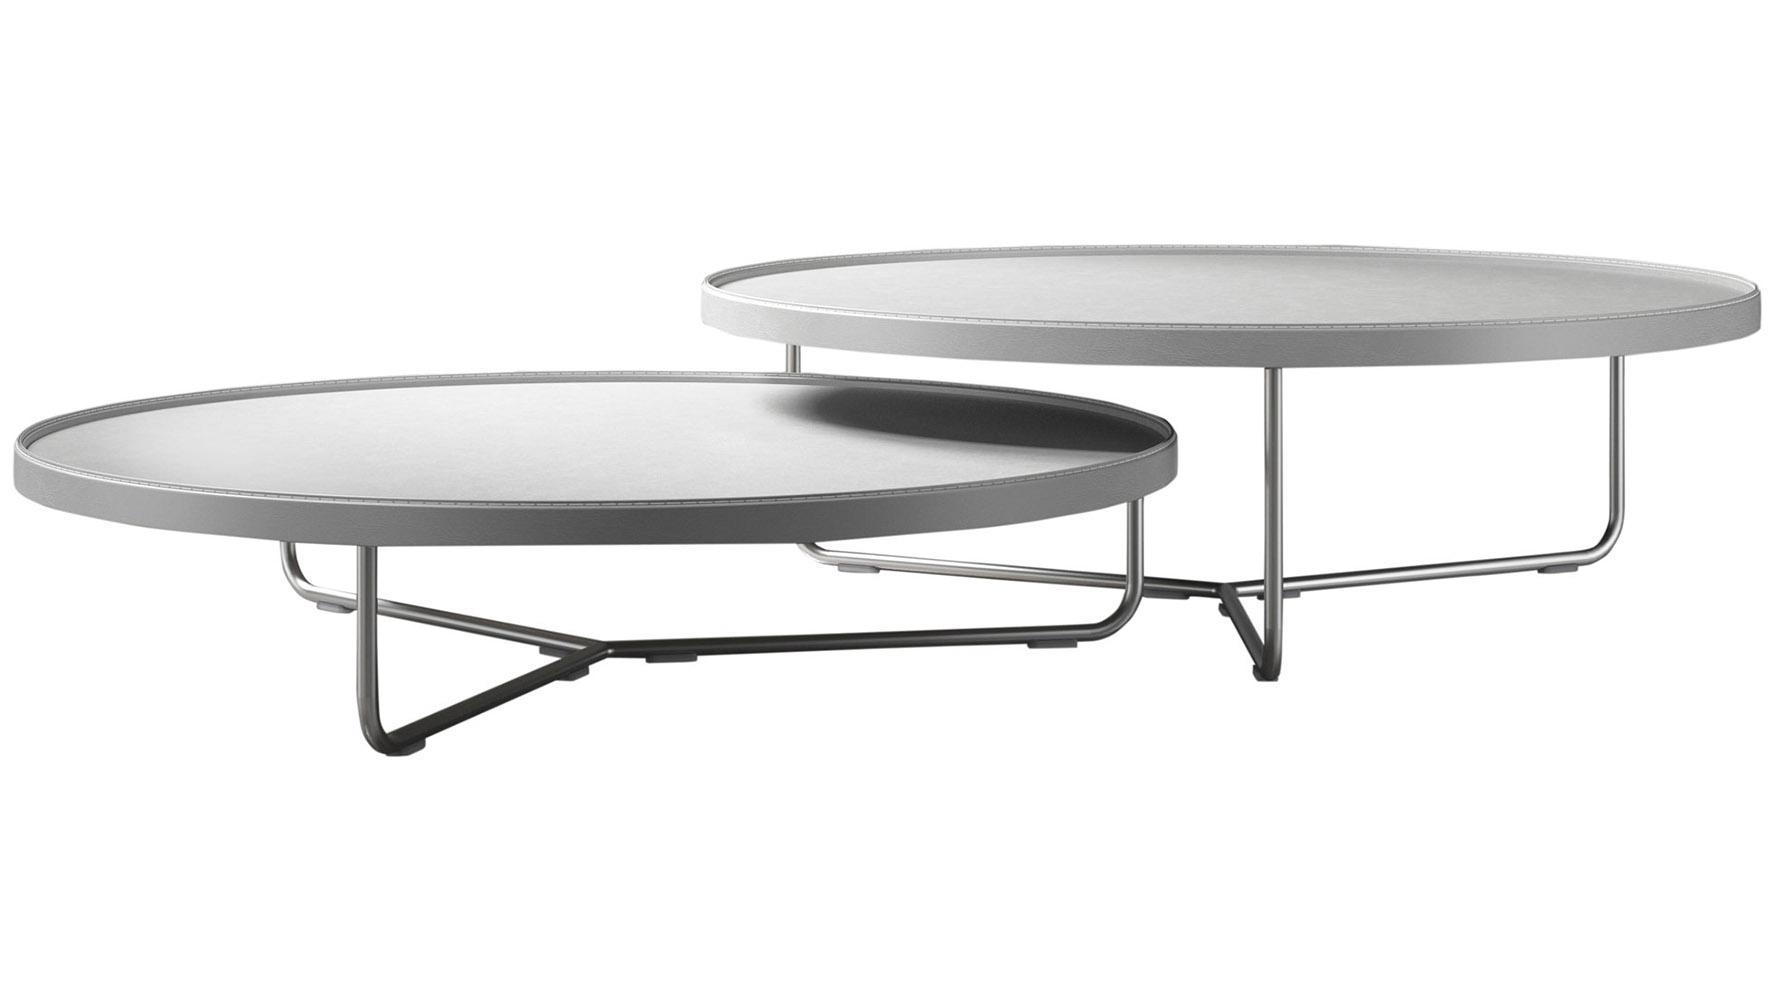 Adair nesting coffee tables zuri furniture adair nesting coffee tables watchthetrailerfo